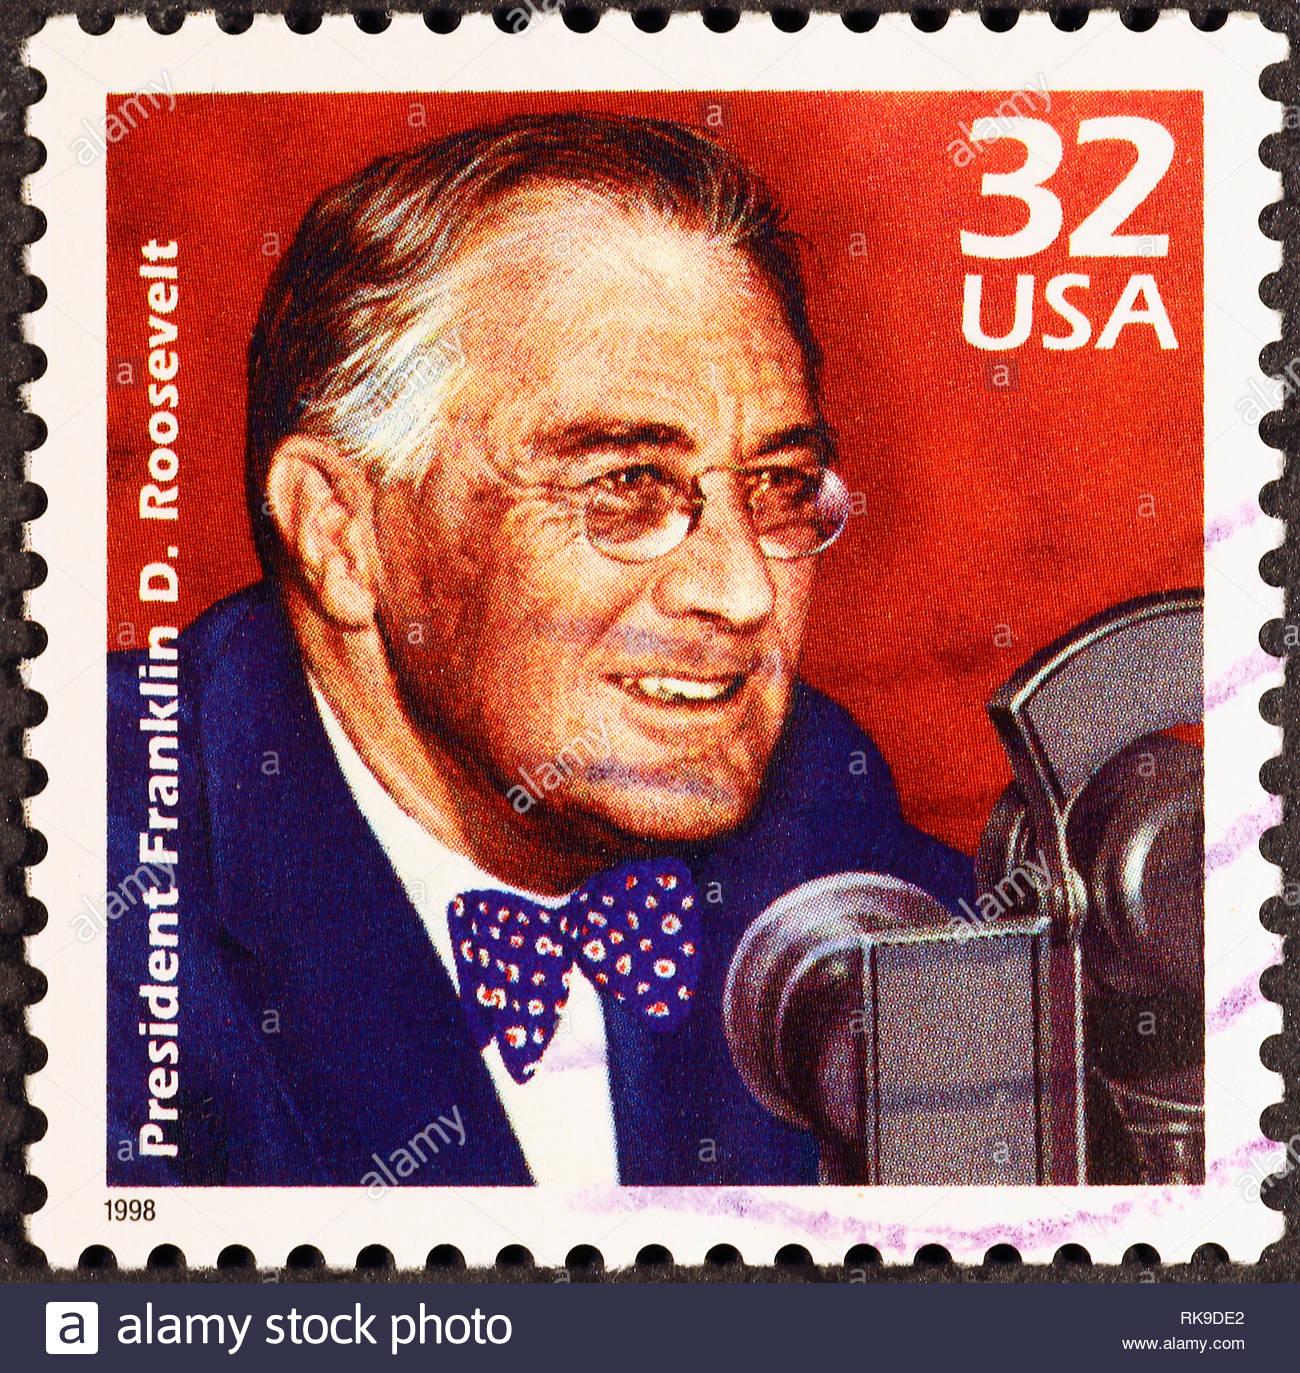 Prasident Franklyn D Roosevelt Auf Amerikanische Briefmarke Stockbild